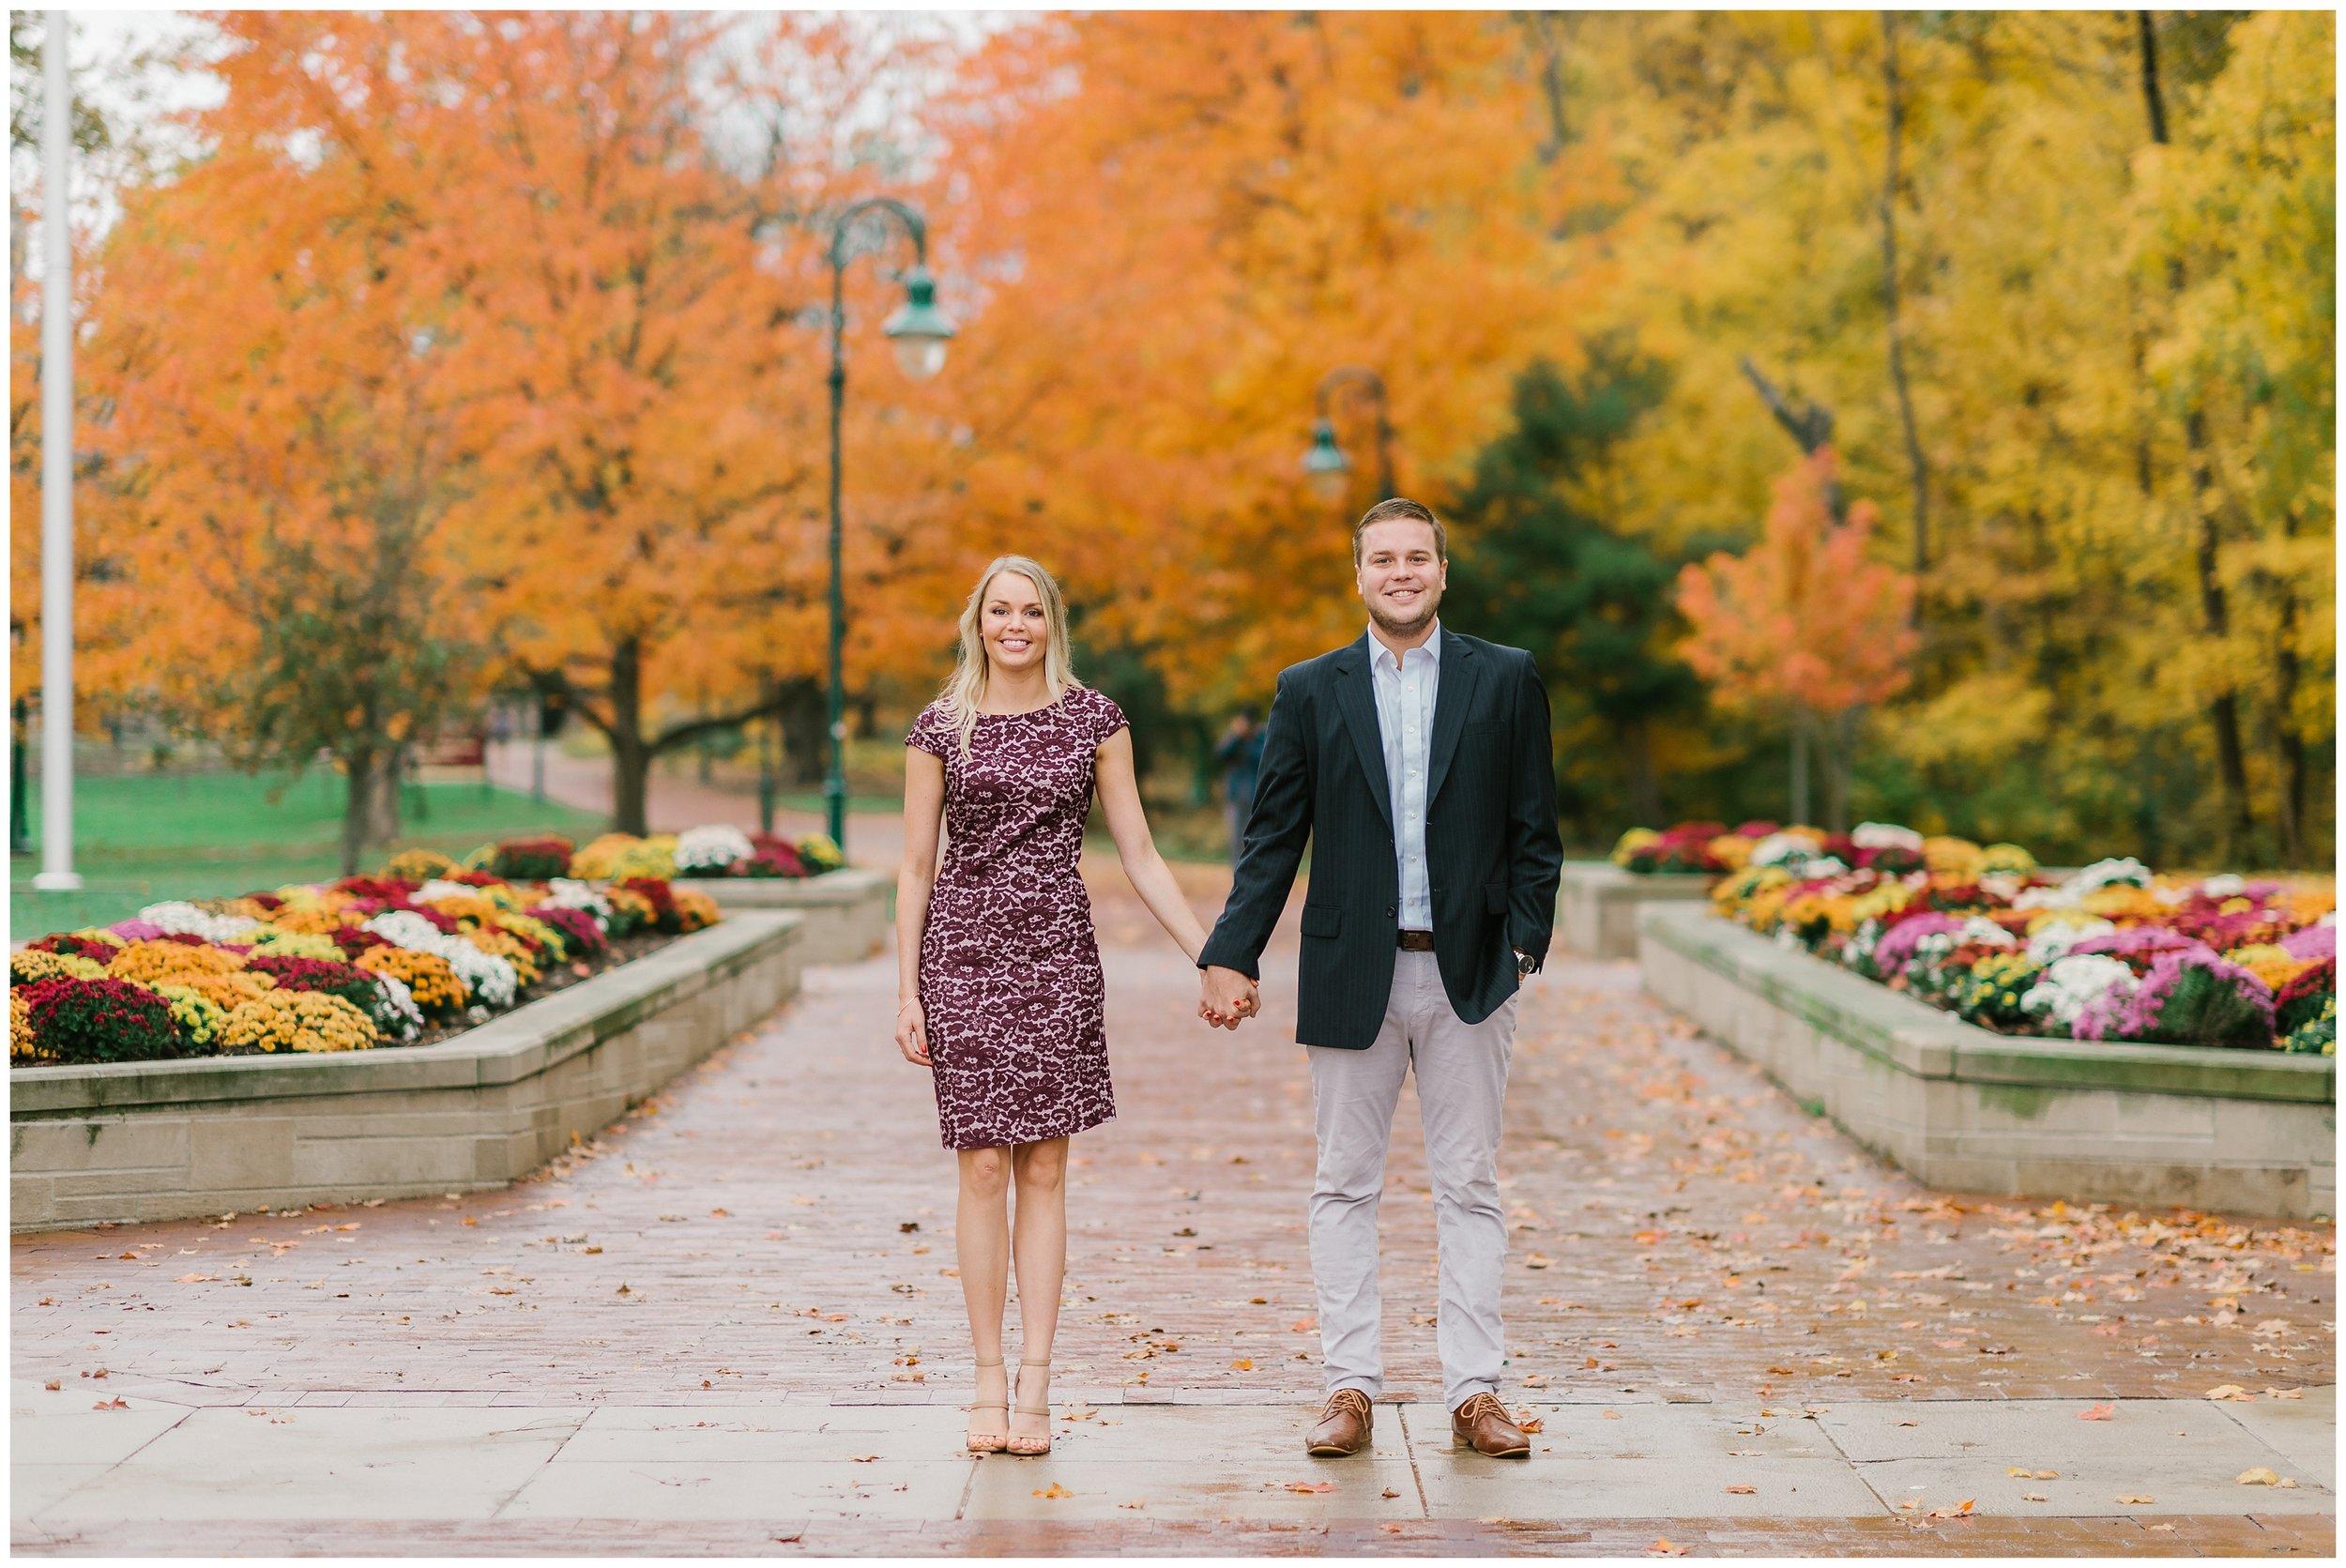 Rebecca_Shehorn_Photography_Indianapolis_Wedding_Photographer_7675.jpg